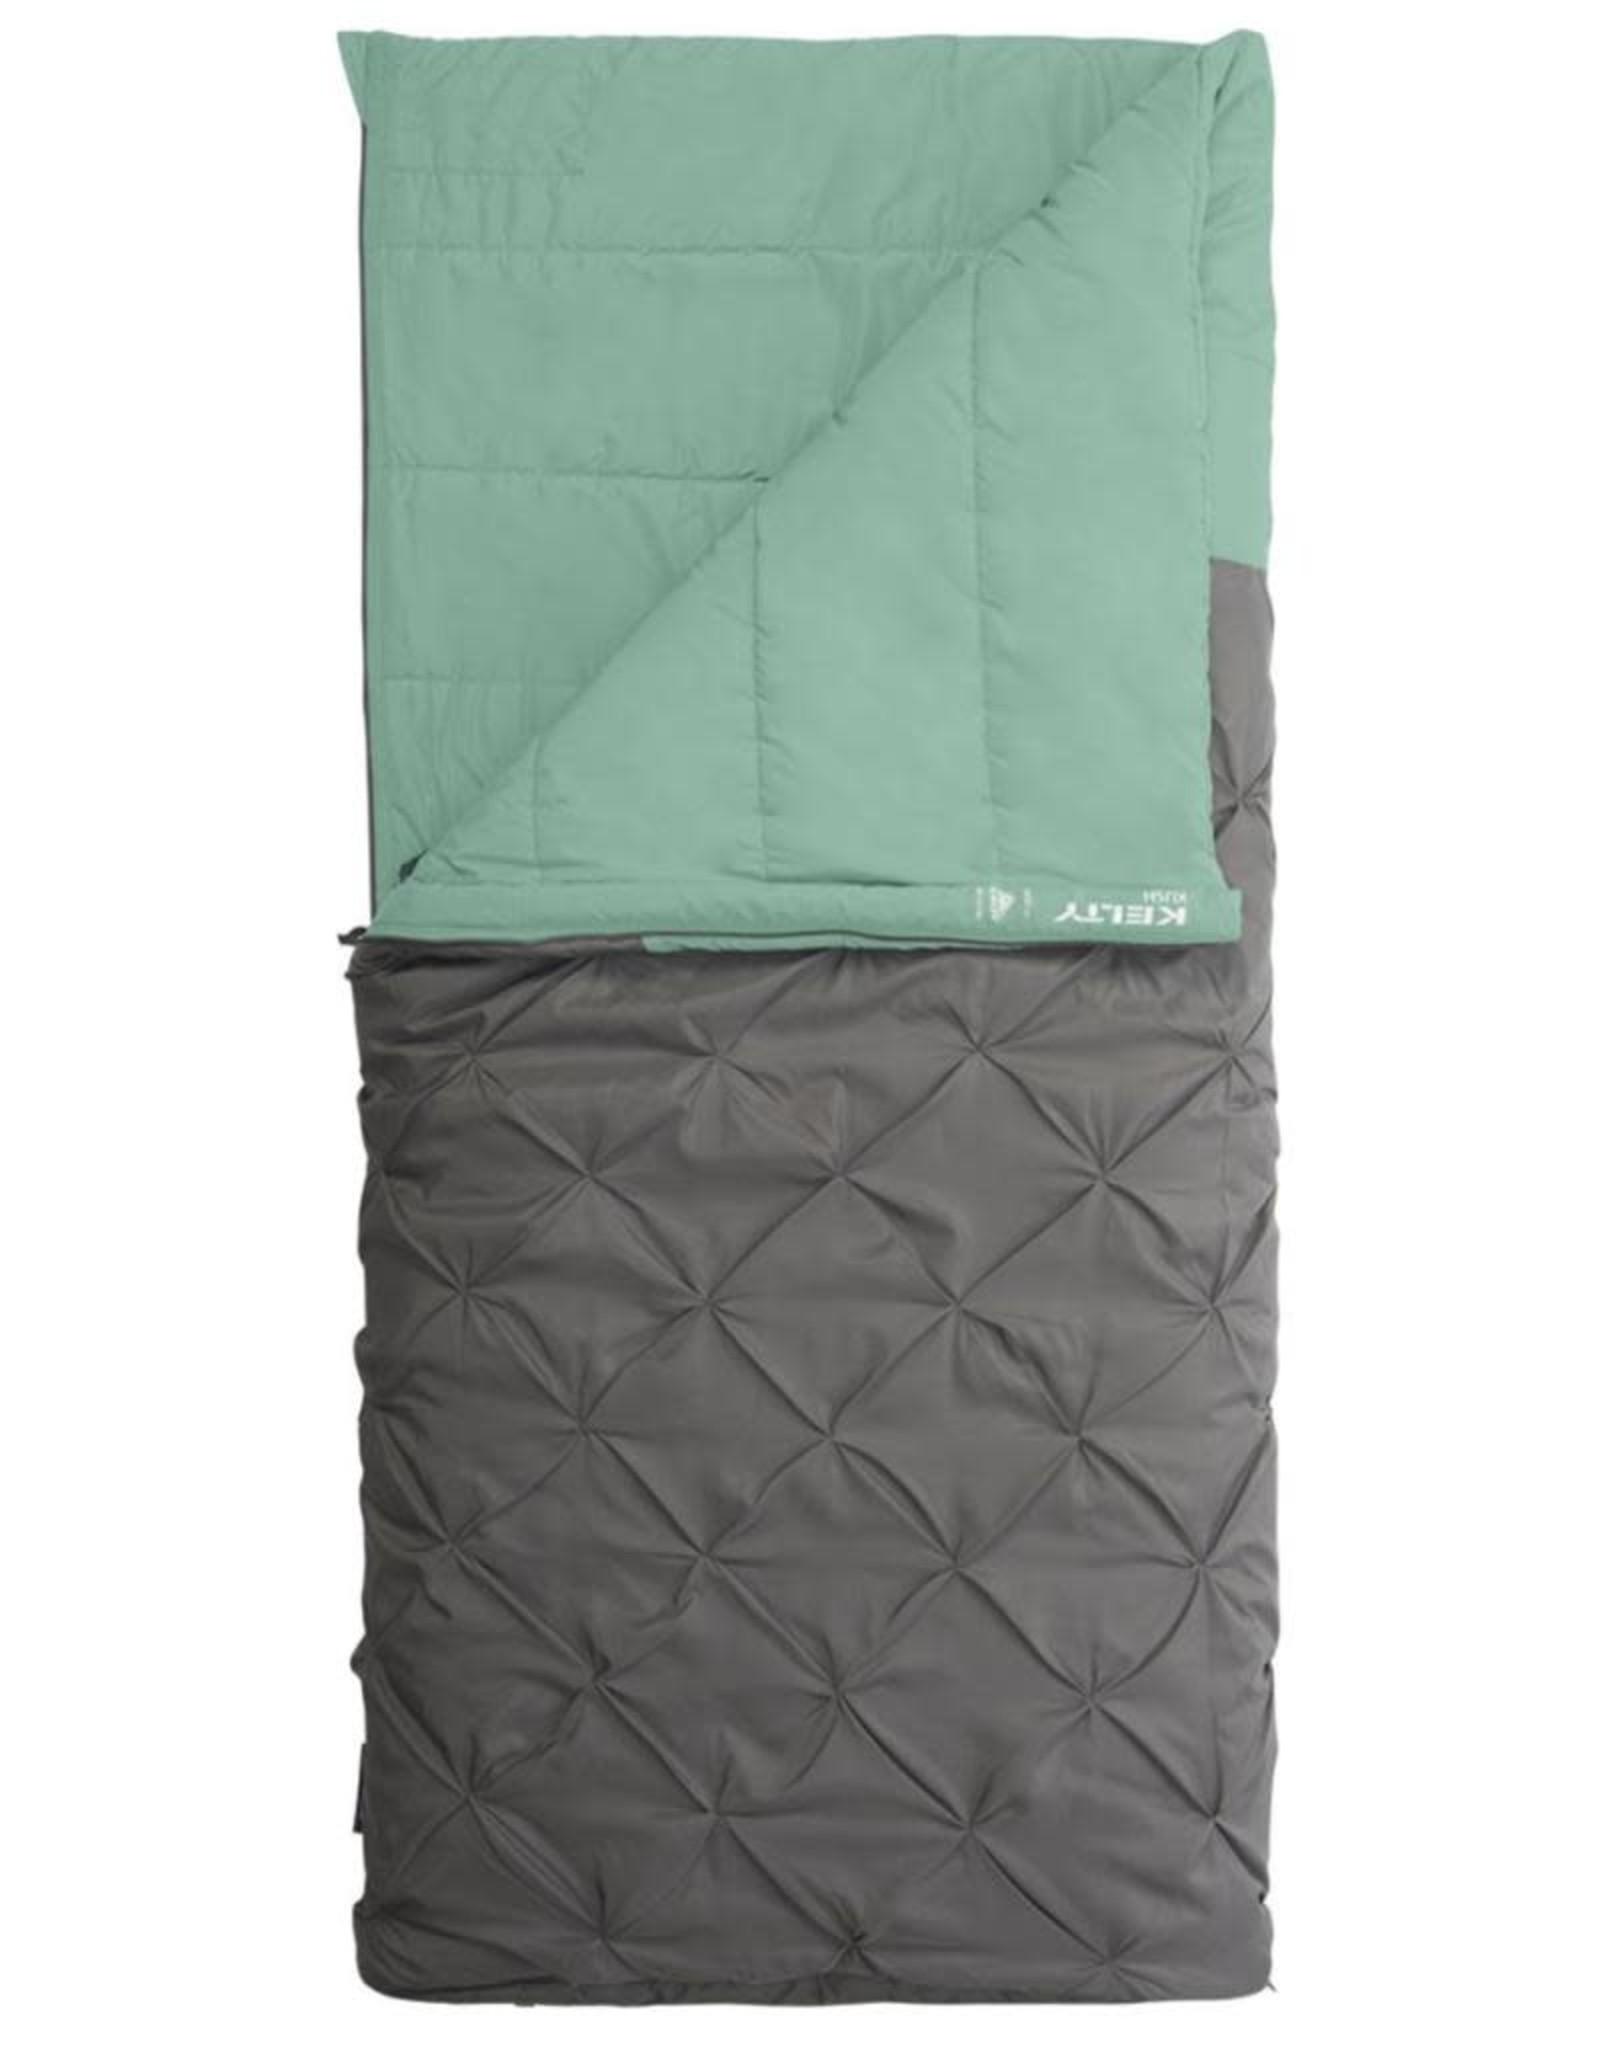 Kelty 30 Degree Kush Sleeping Bag Set